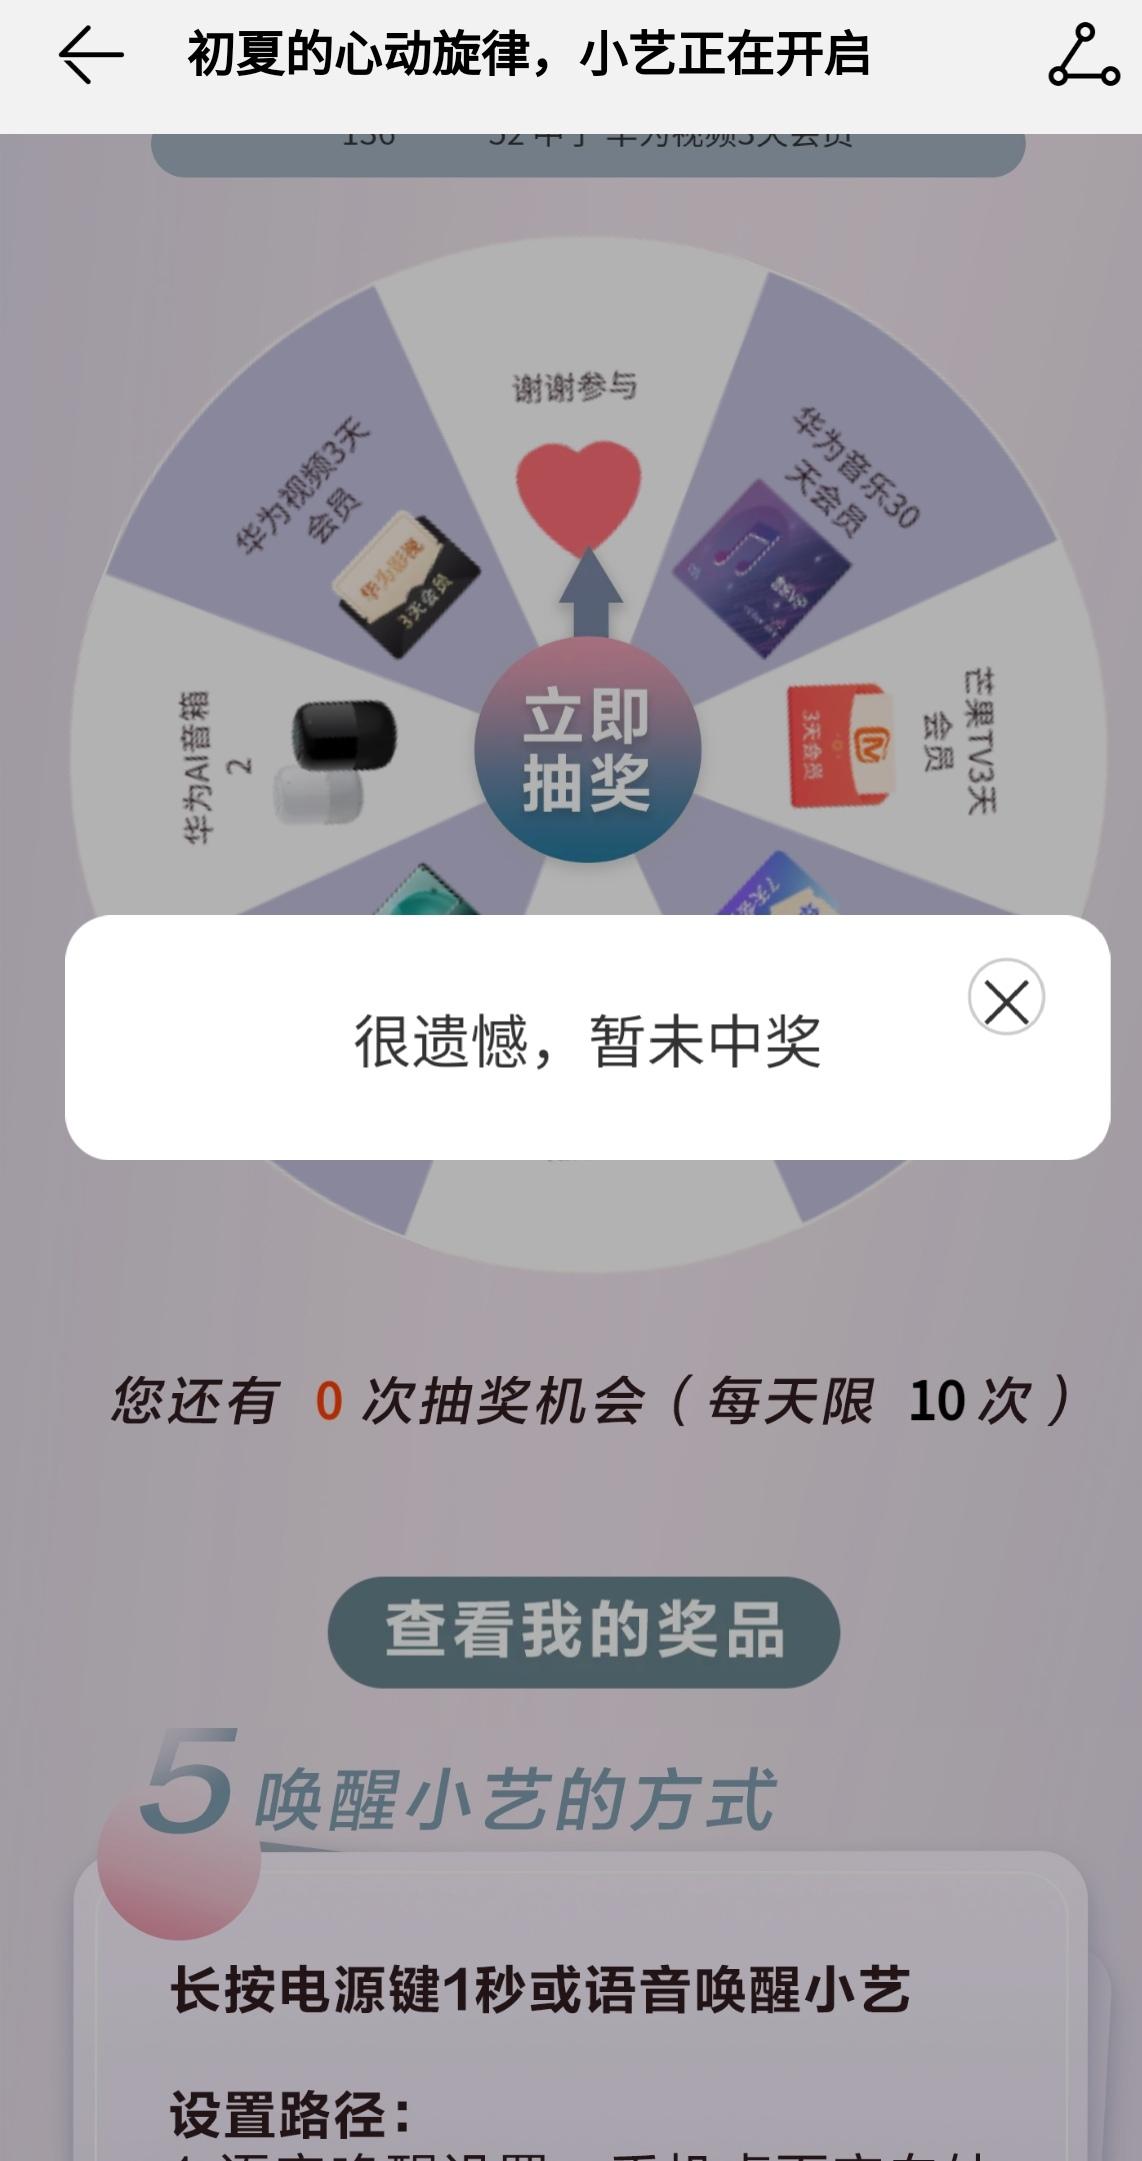 Screenshot_20210514_110859_com.android.mediacenter_edit_8087501719078.jpg